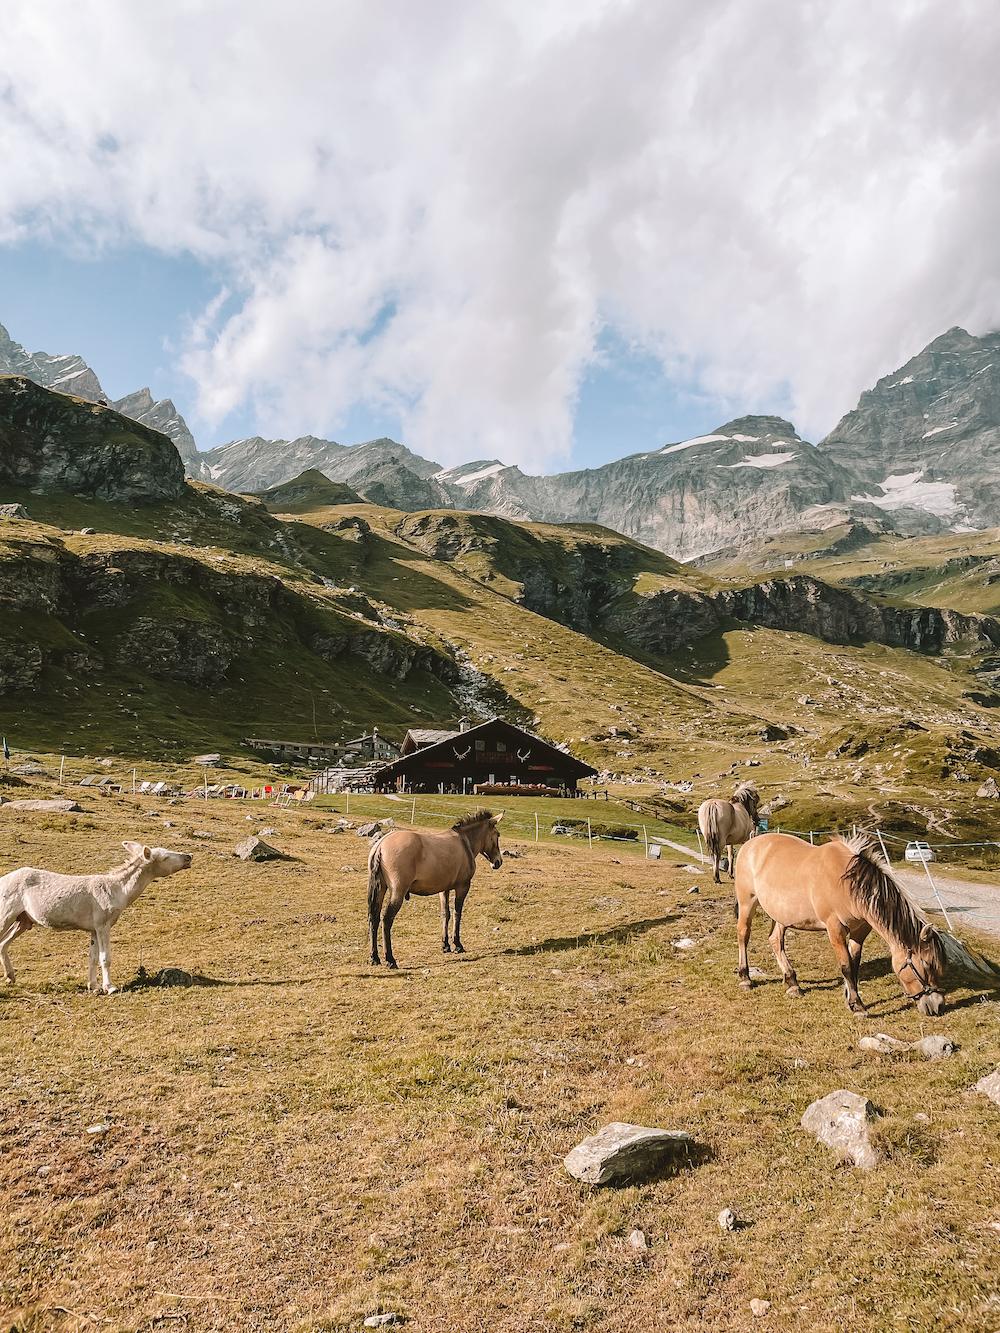 Natuur bij Breuil-Cervinia